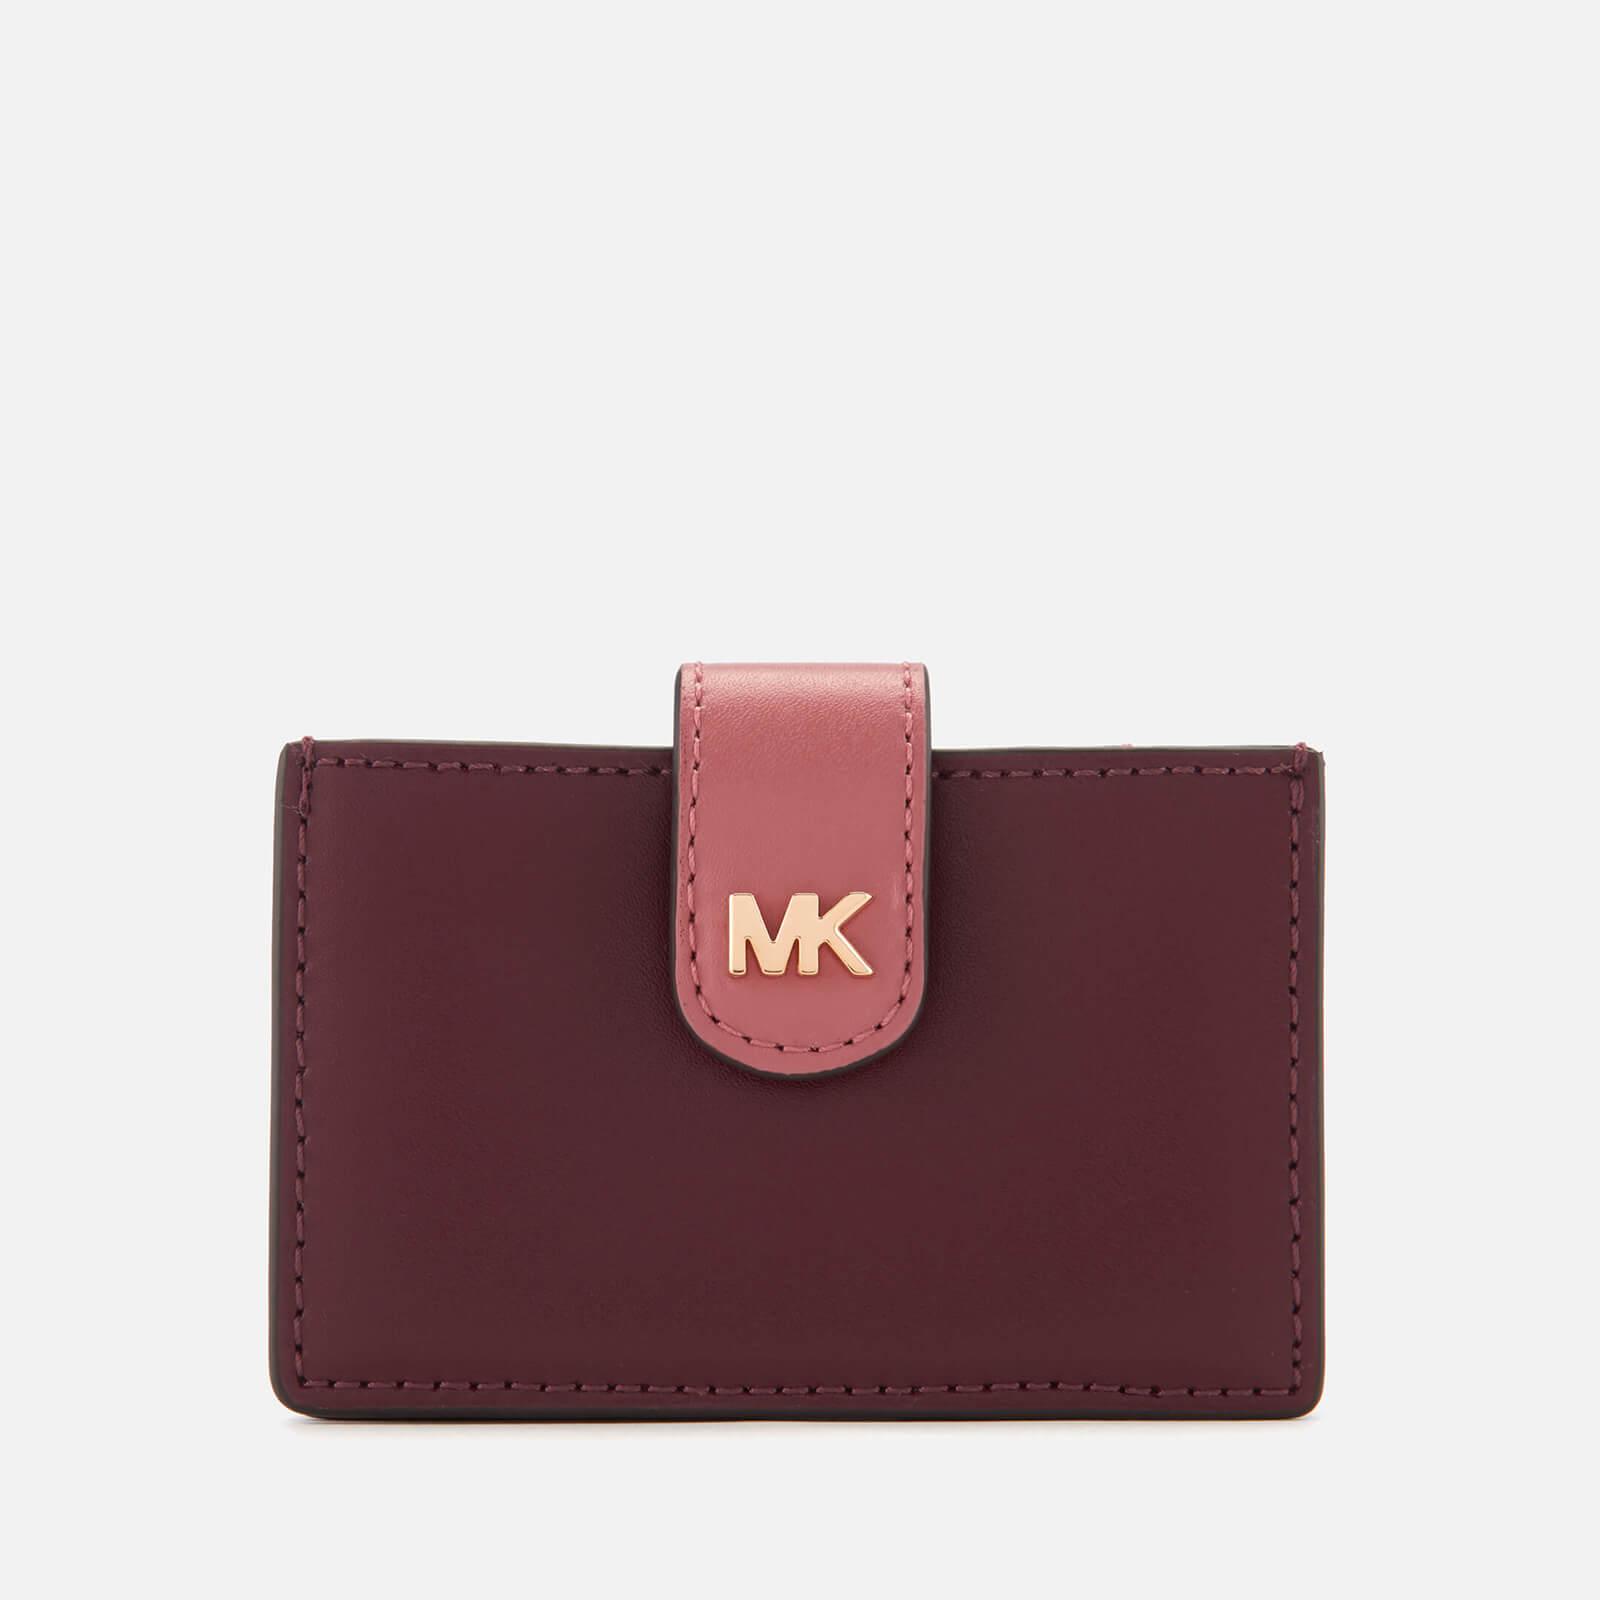 dbef53e7b315 MICHAEL MICHAEL KORS Women s Money Pieces Card Case - Oxblood Multi Womens  Accessories